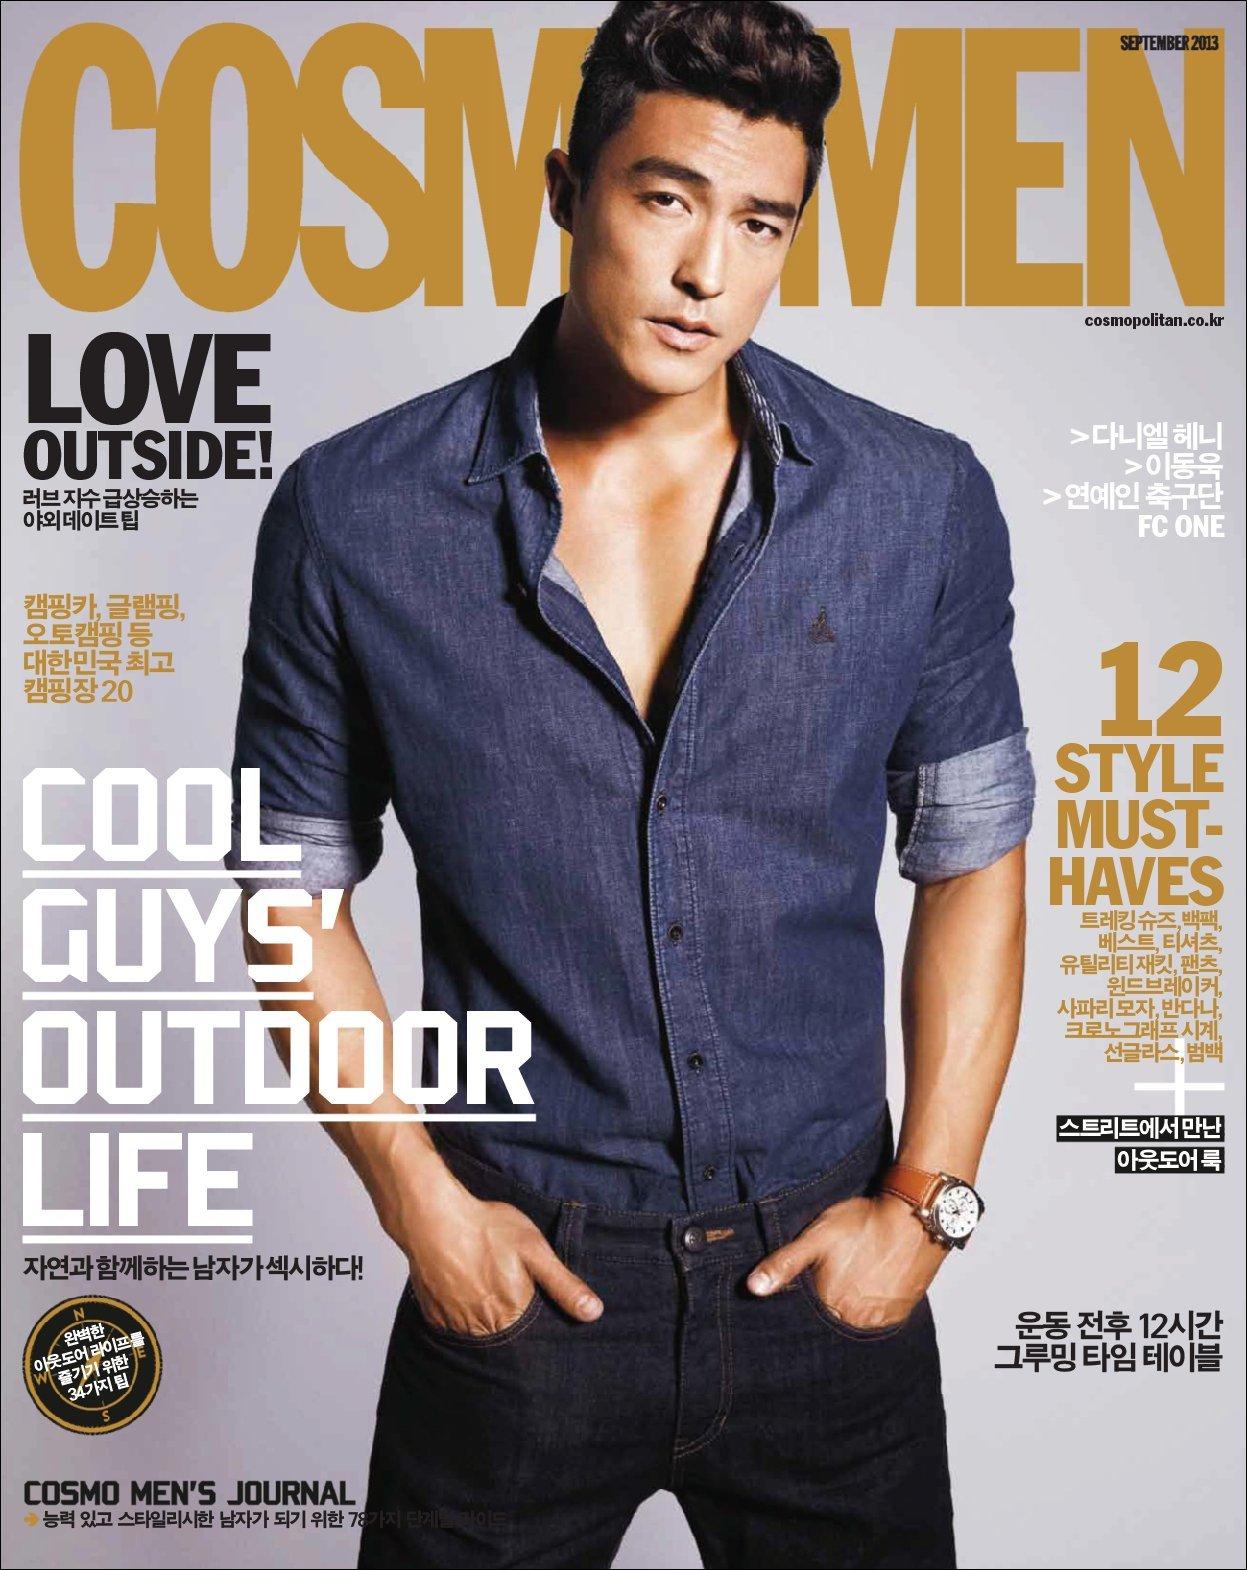 Cosmo Men Korea Digital